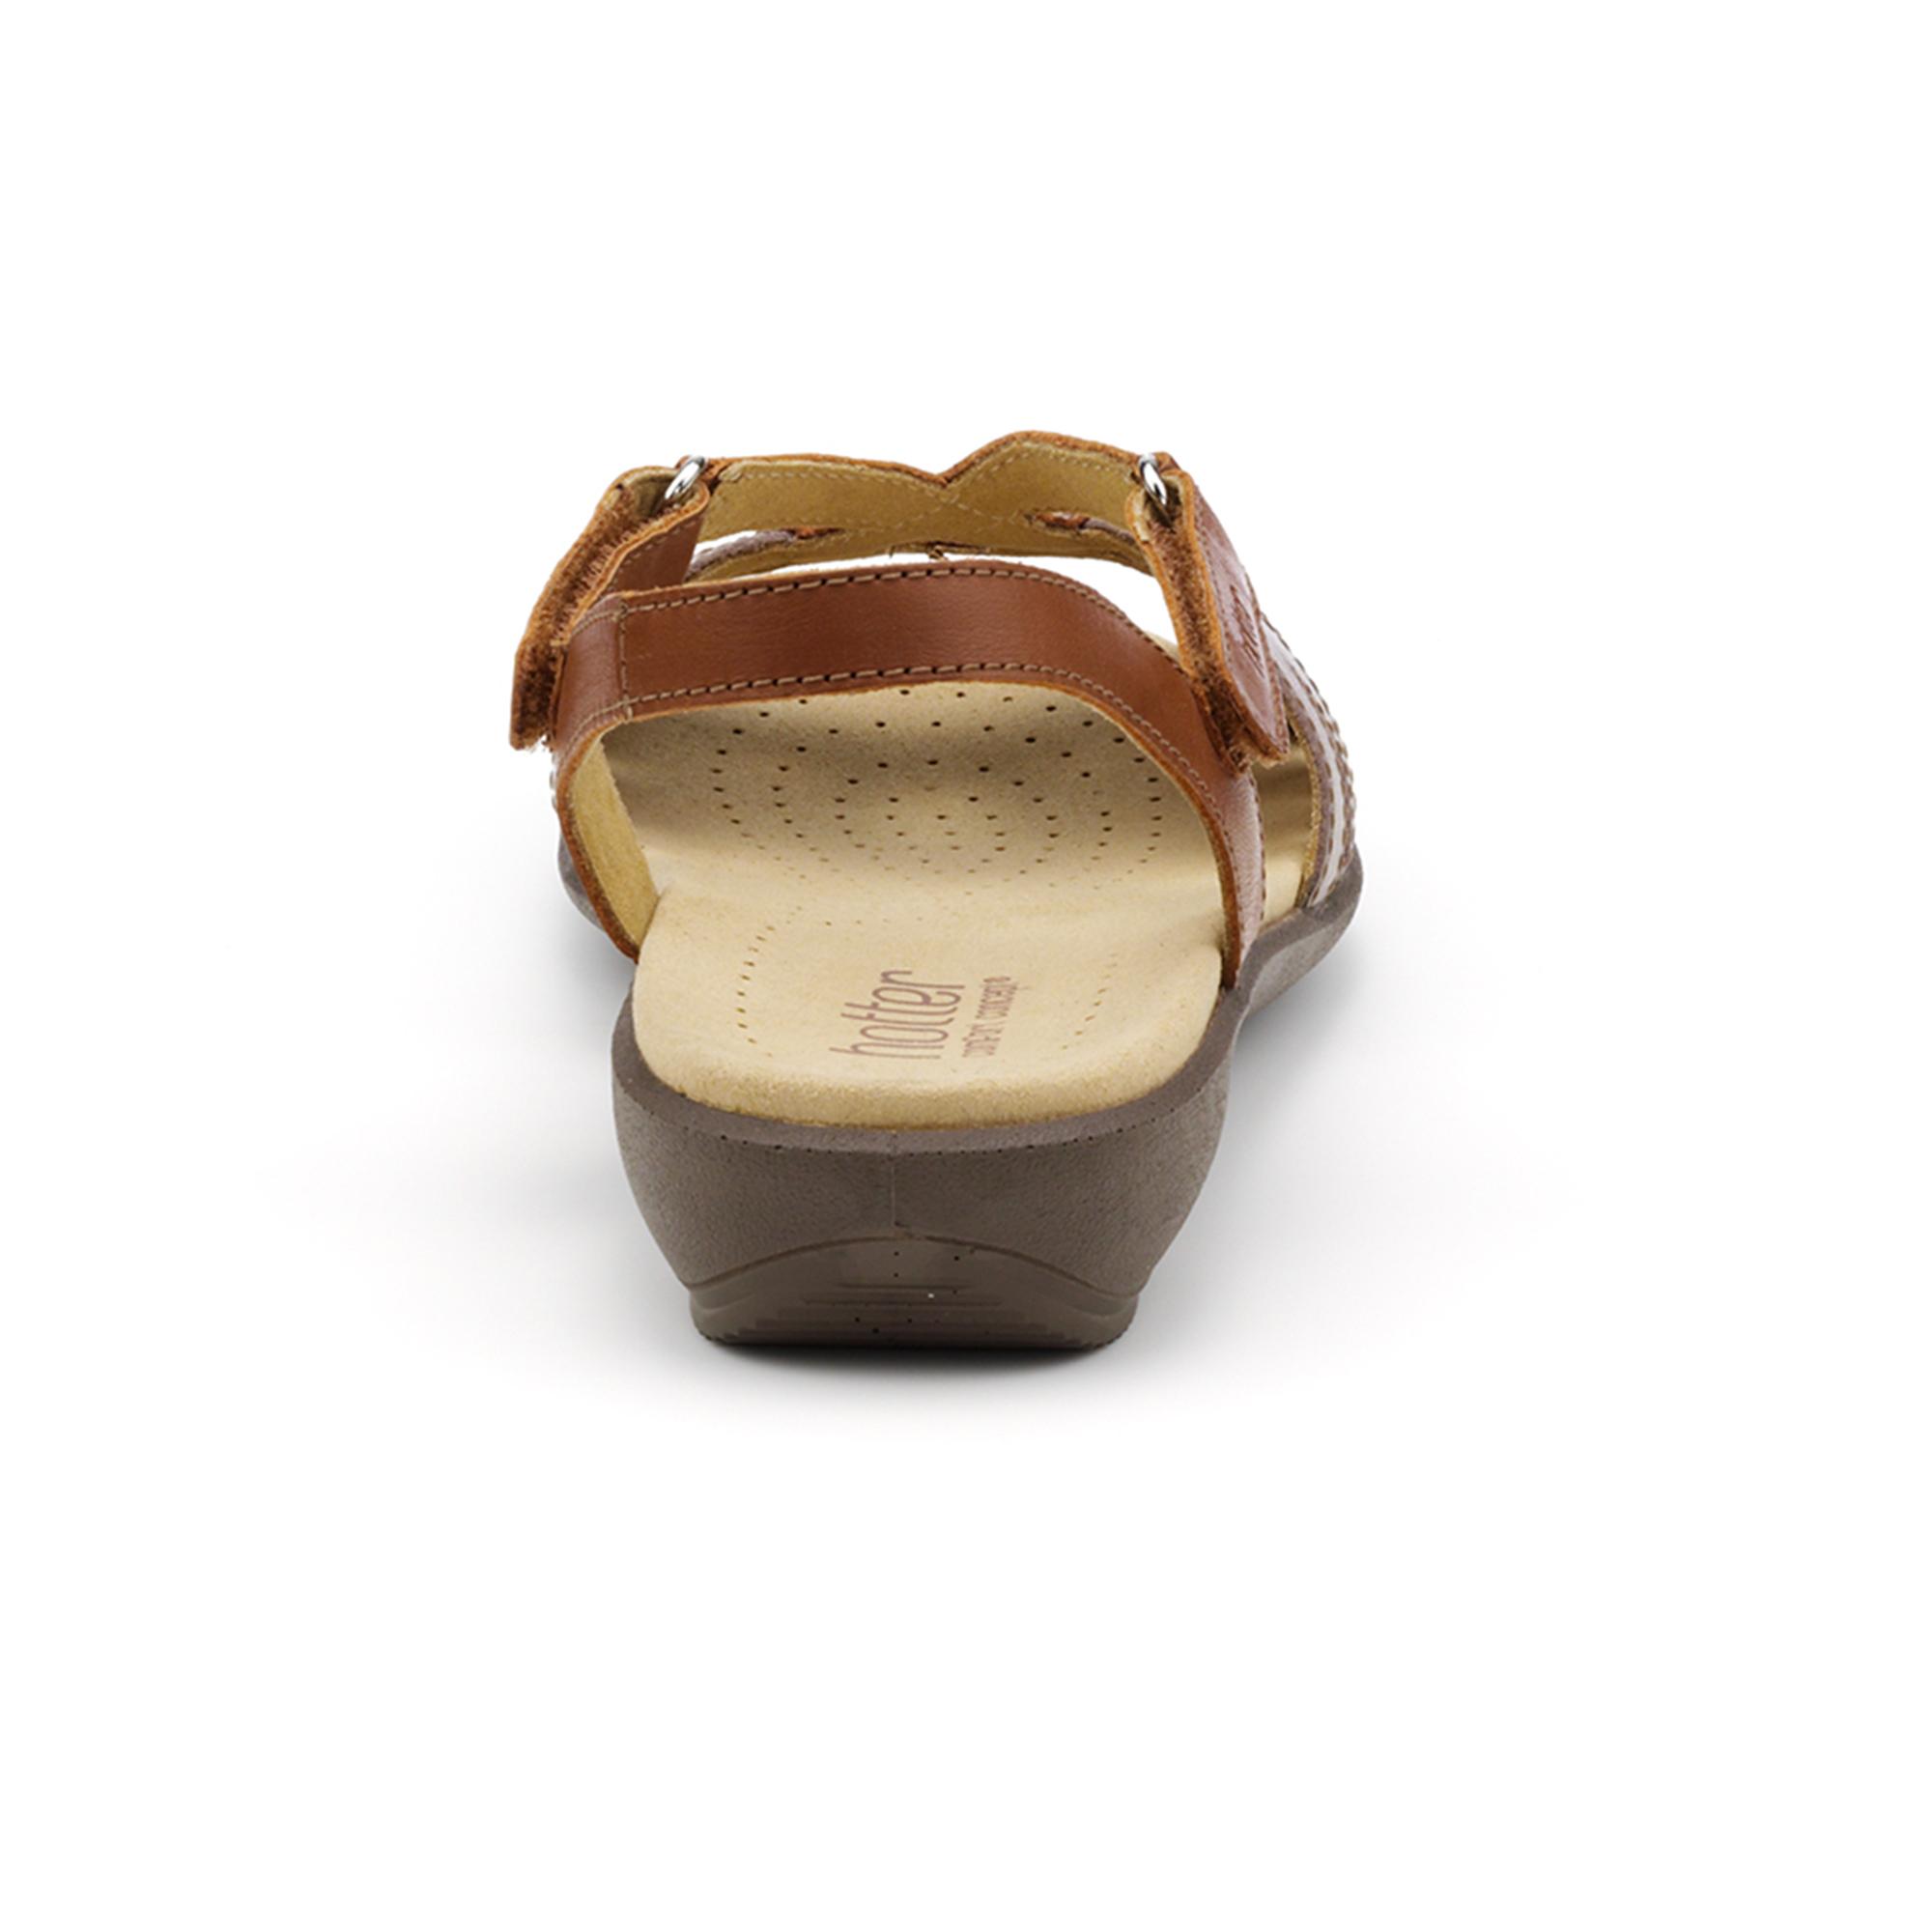 Hotter-Mujer-Flare-Senora-Tacon-Bajo-Sandalia-Verano-Casual-Calzado-Cuero-Textil